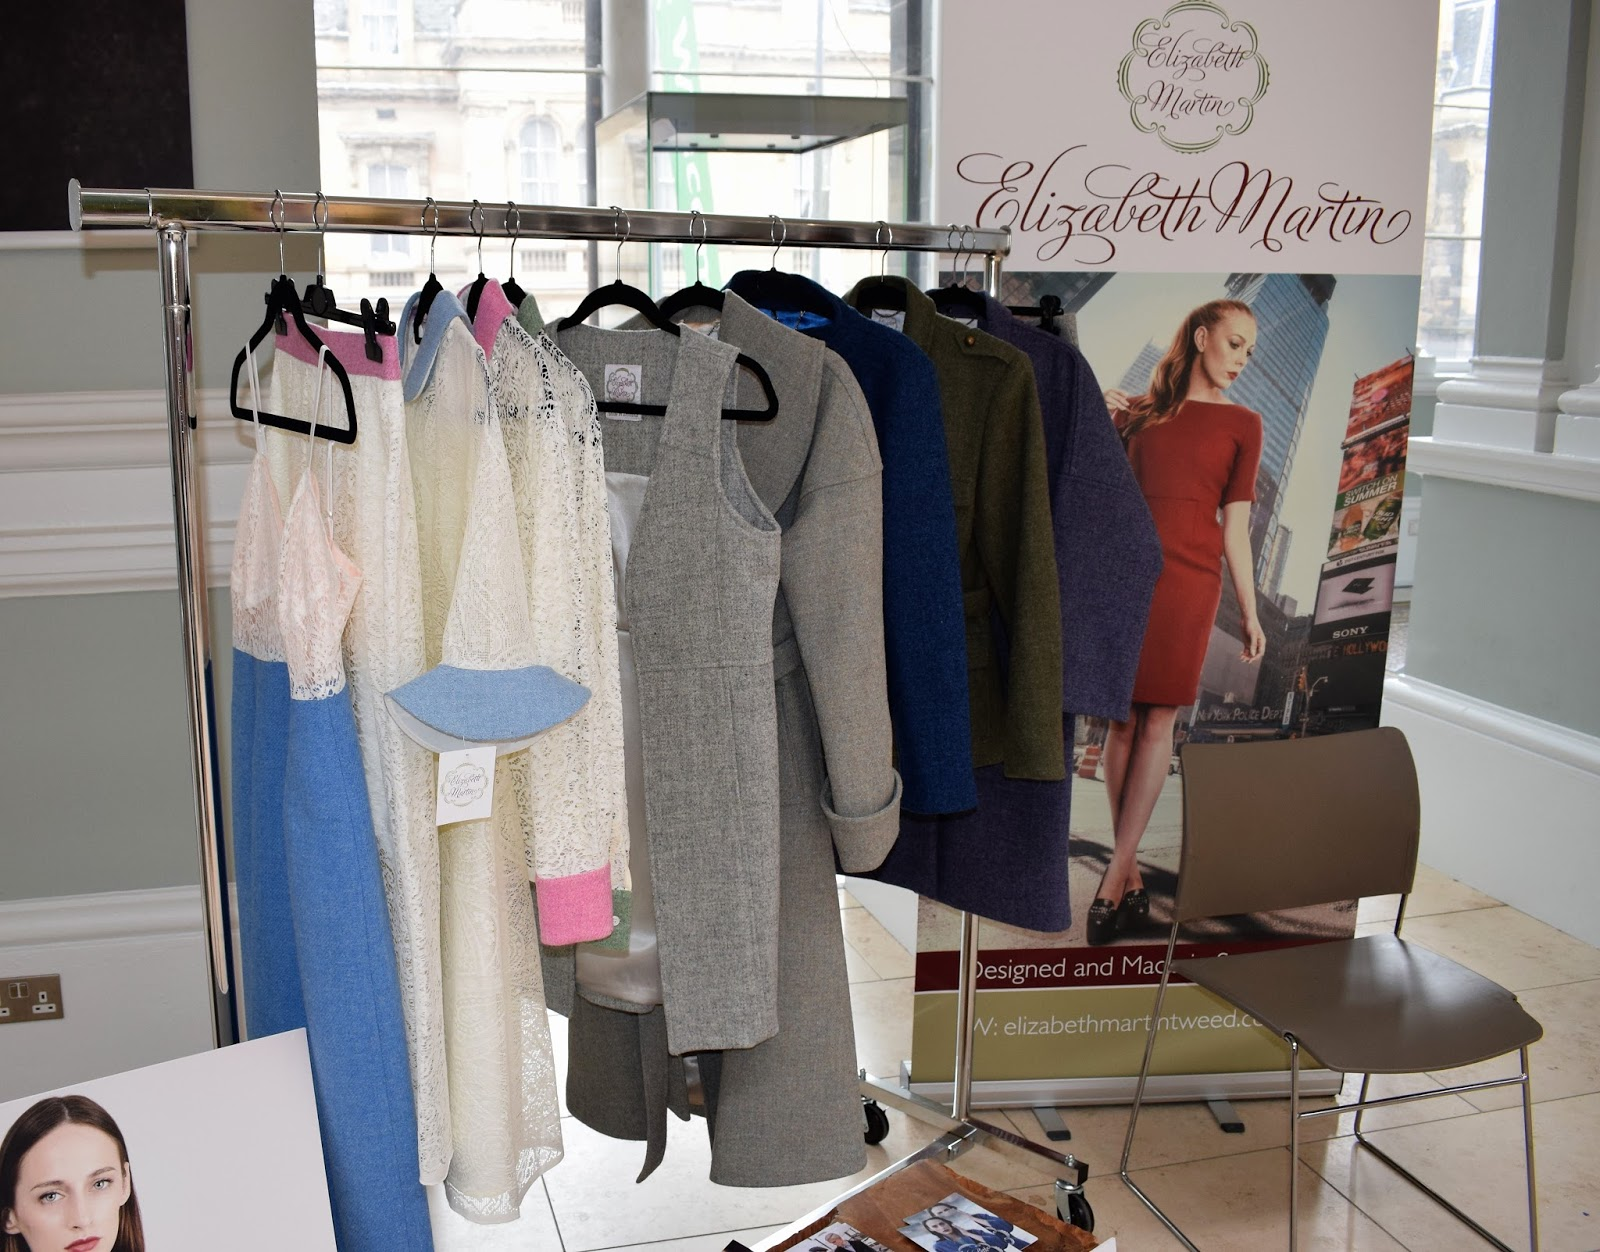 new Scottish design form Elizabeth Martin tweed, contemporary lace and tweed, new fashion collection from International Fashion Festival Edinburgh